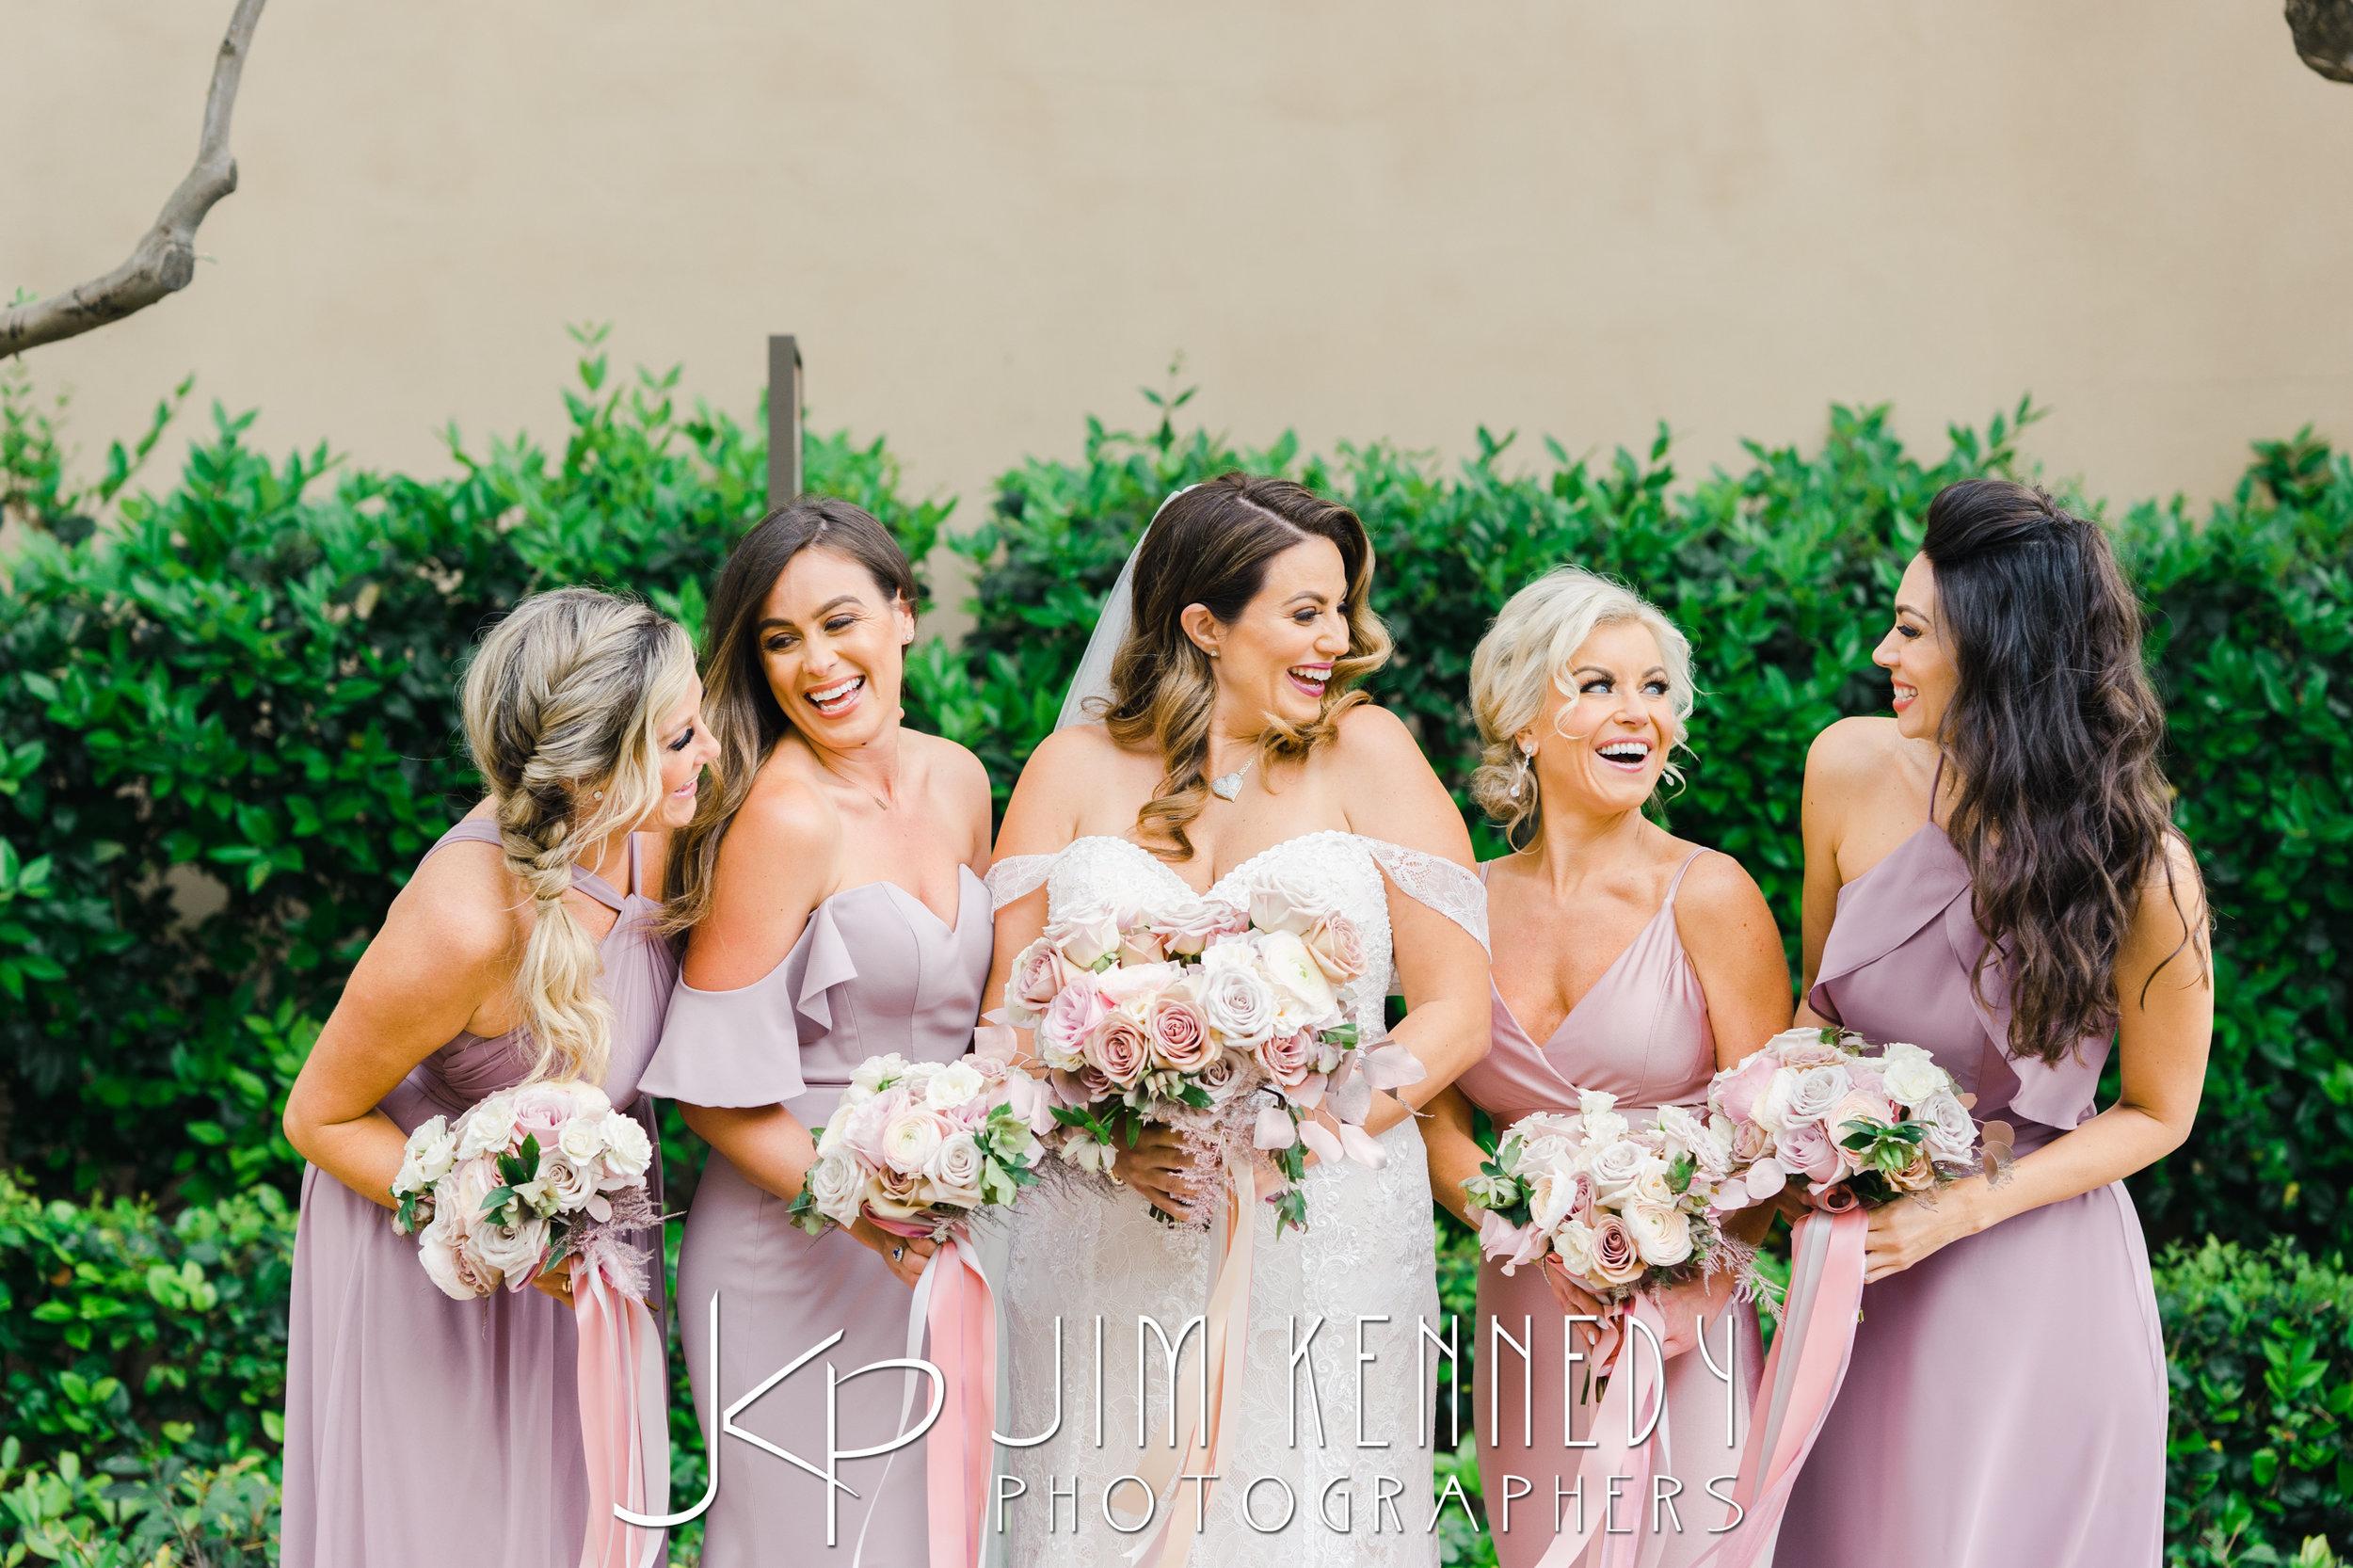 pelican-hill-wedding-jim-kenedy-photographers_0051.JPG